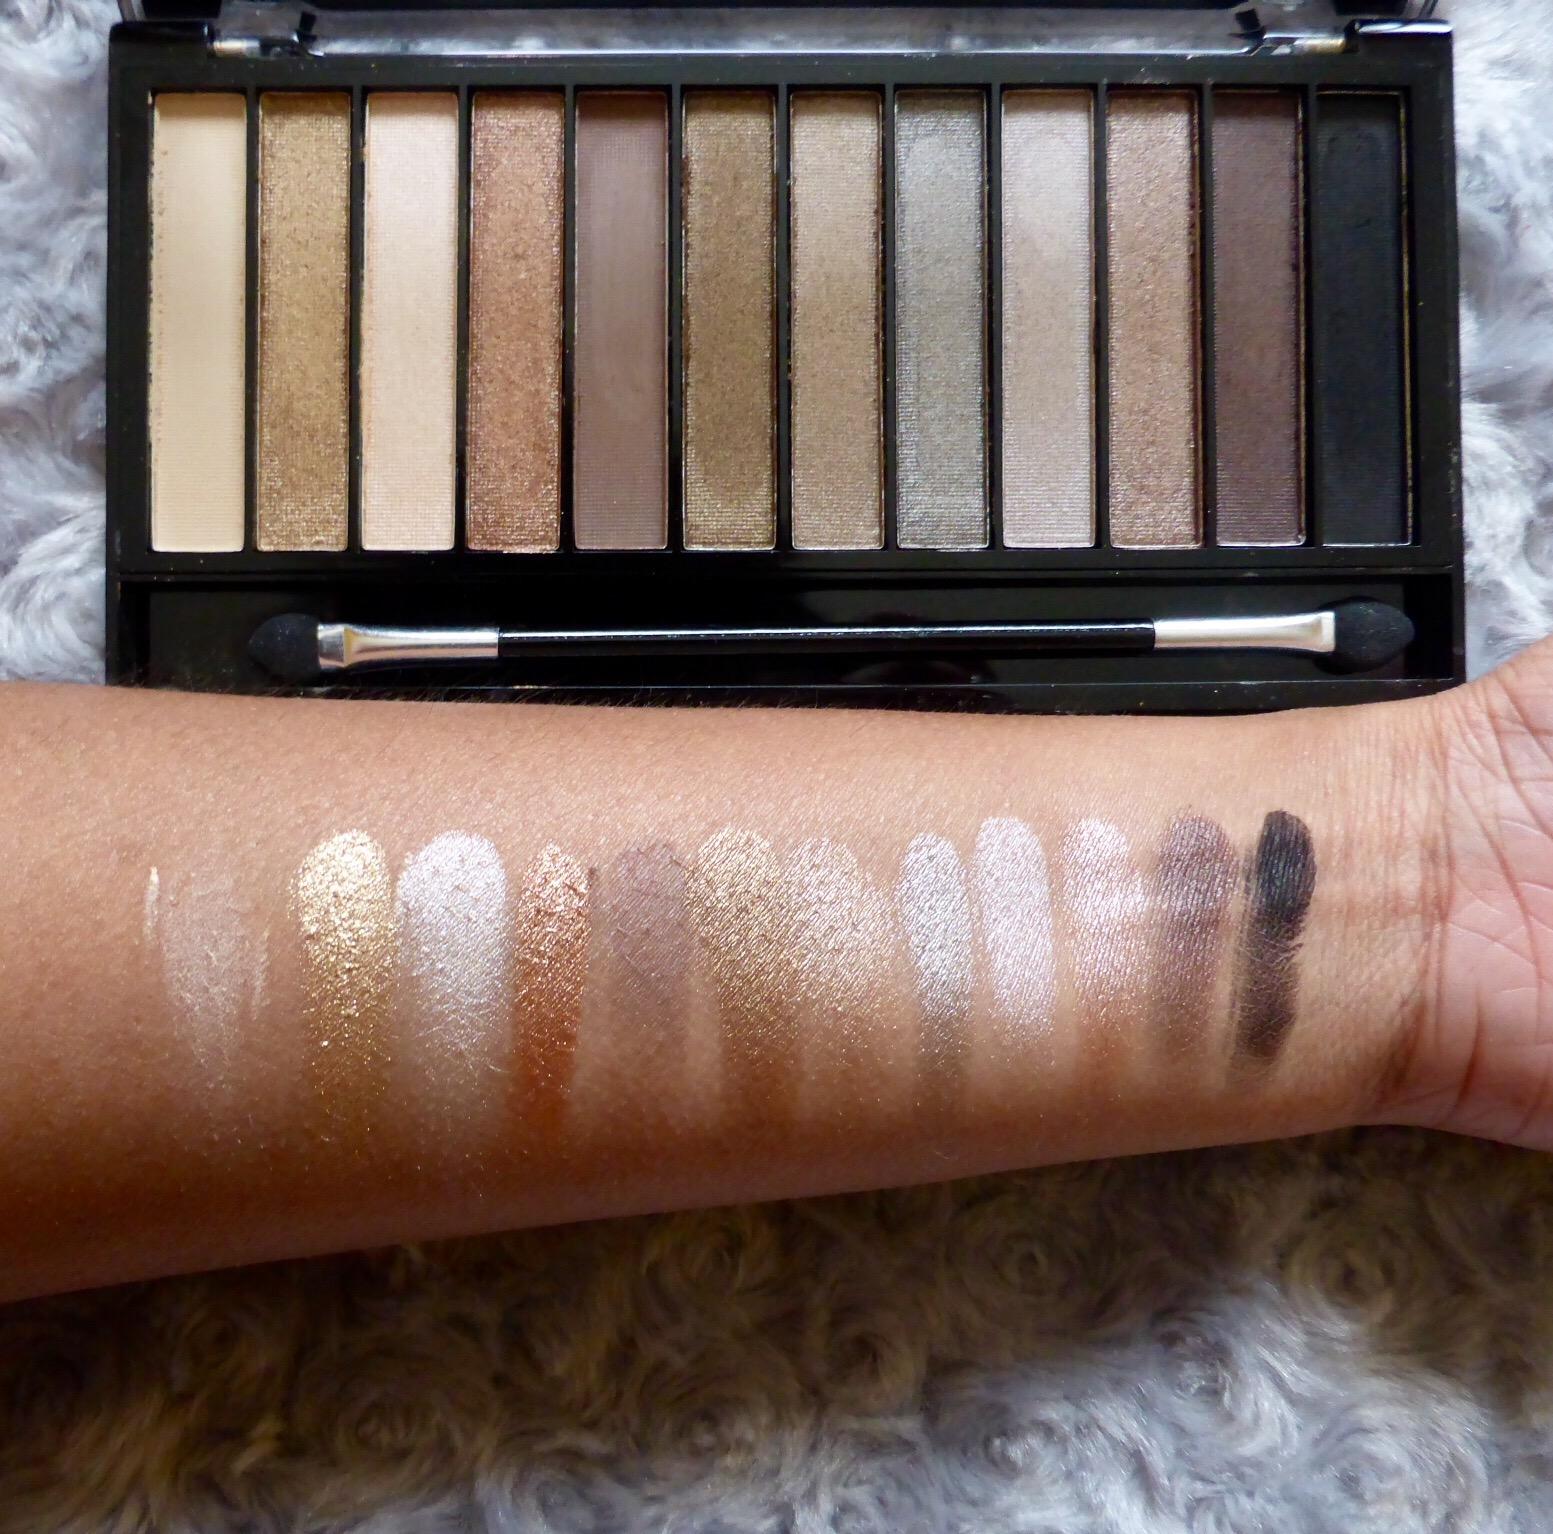 Makeup revolution palette price